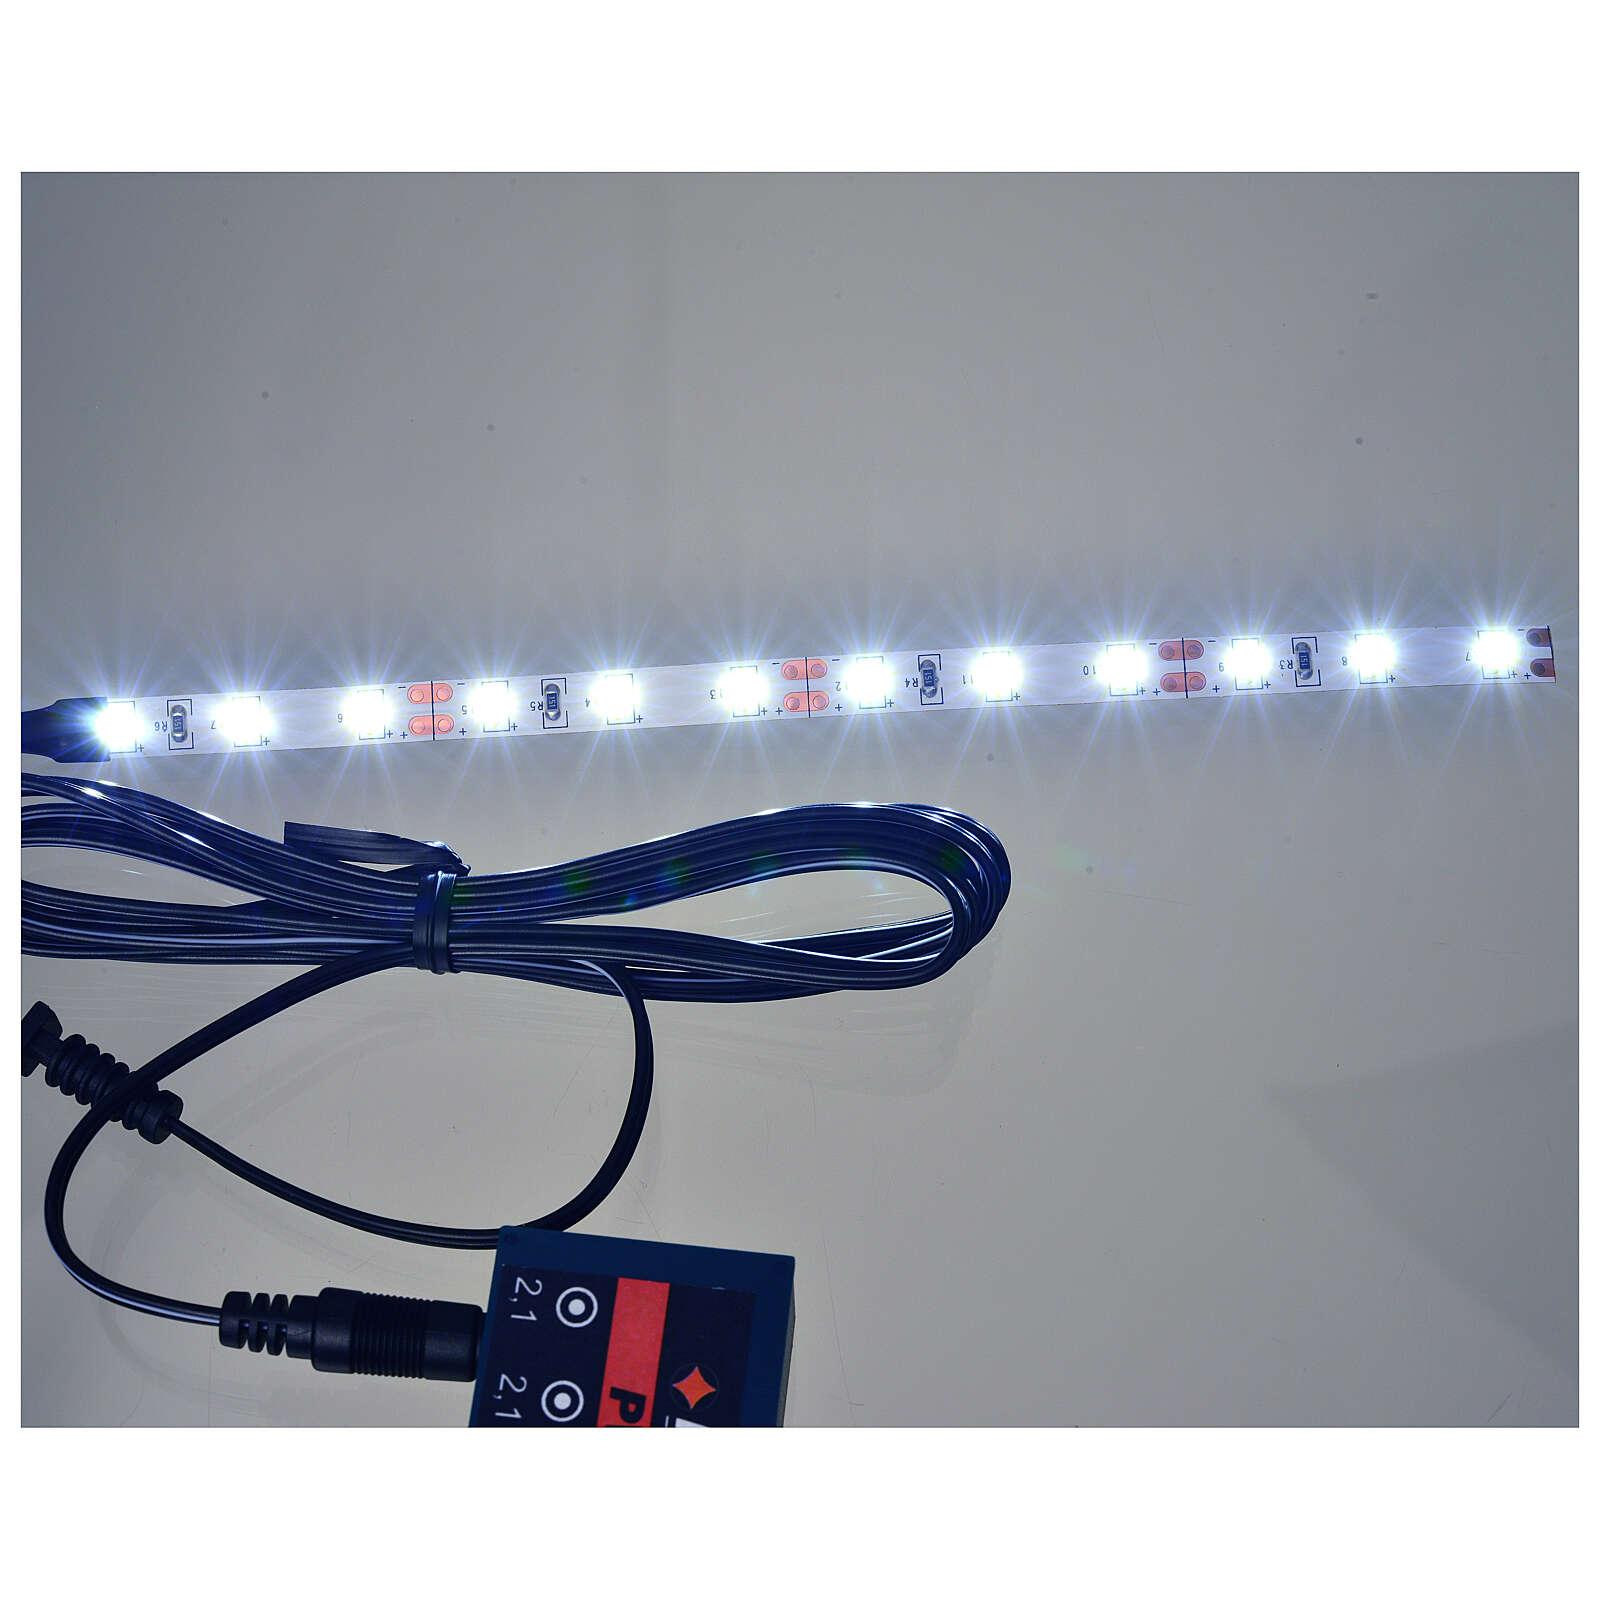 Tira de 12 LED cm. 0.8x16 cm. blanca fría Frisalight 4